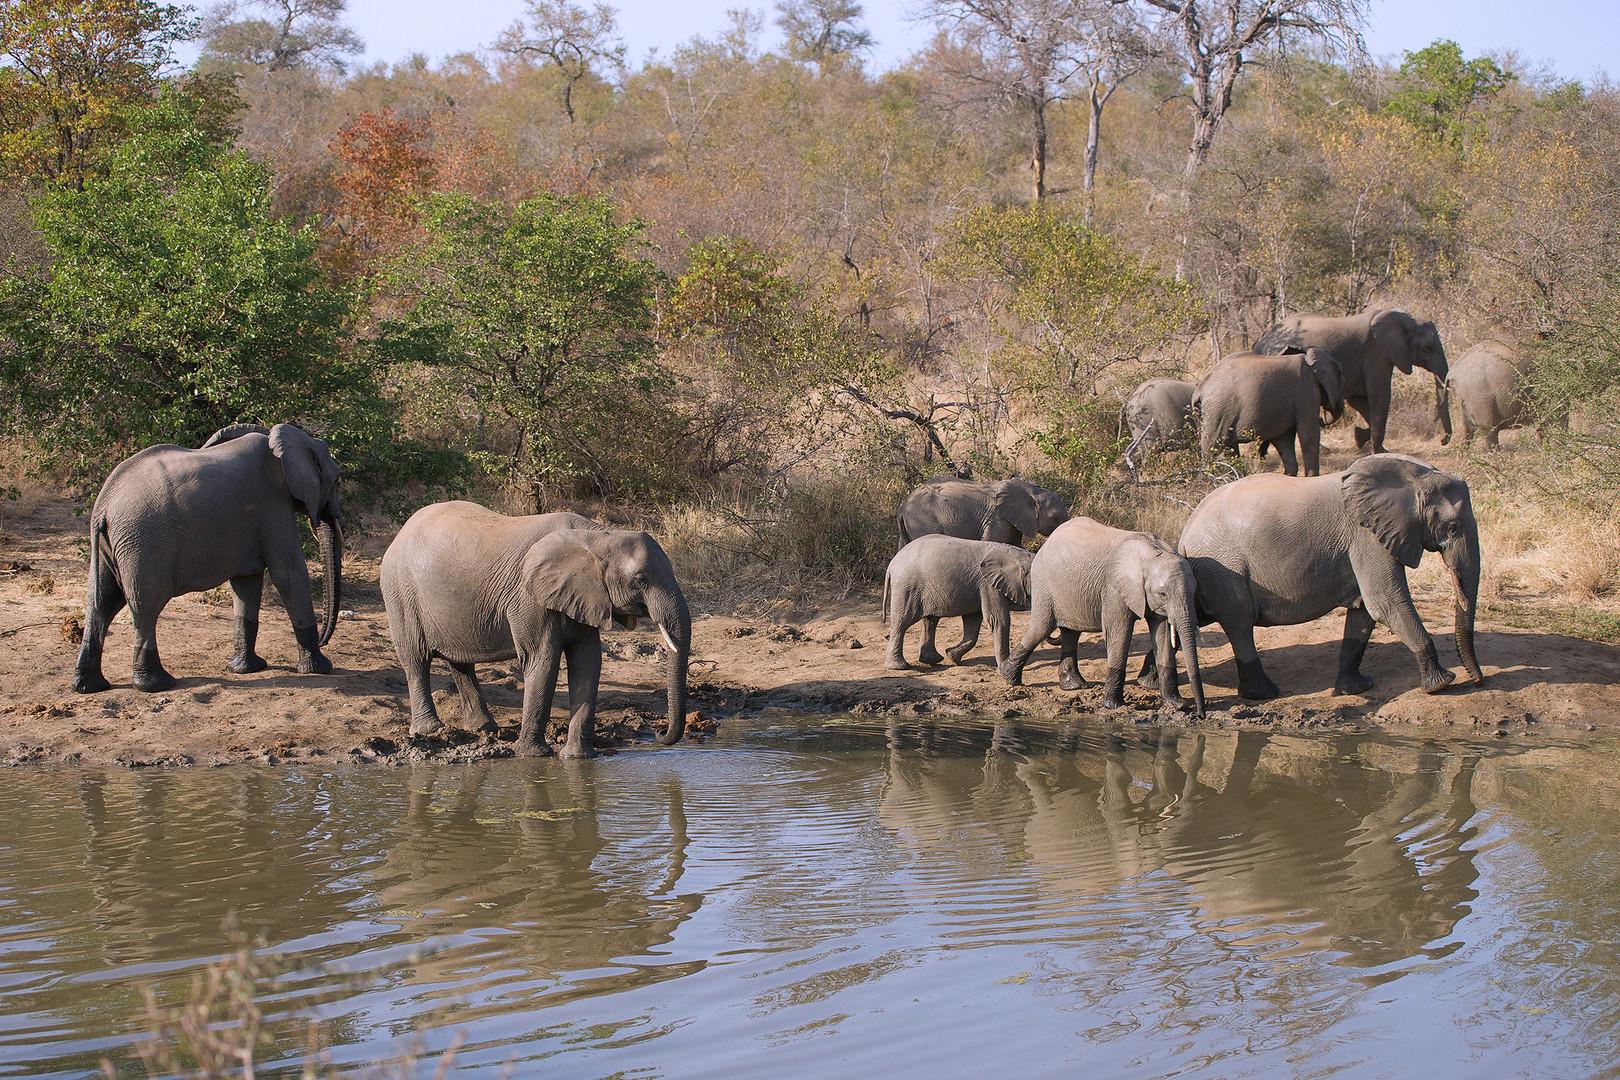 Elefantenherde an der Tränke